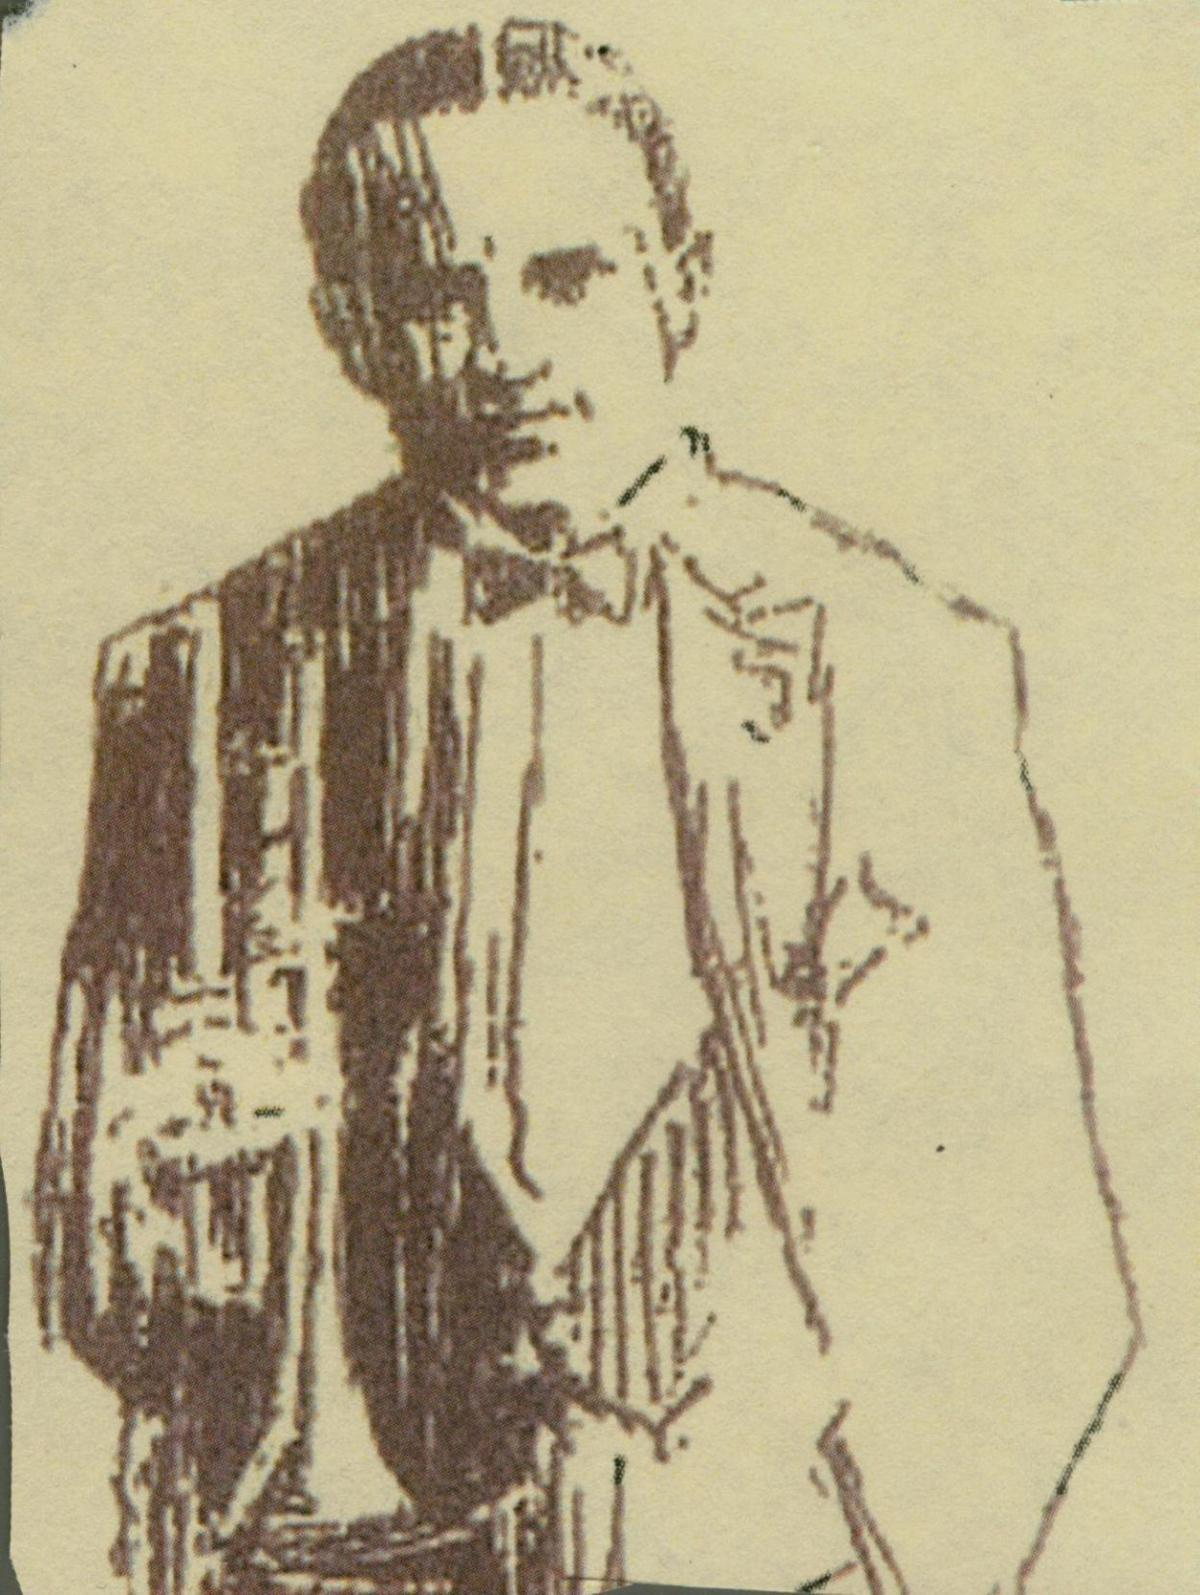 Bix illustration